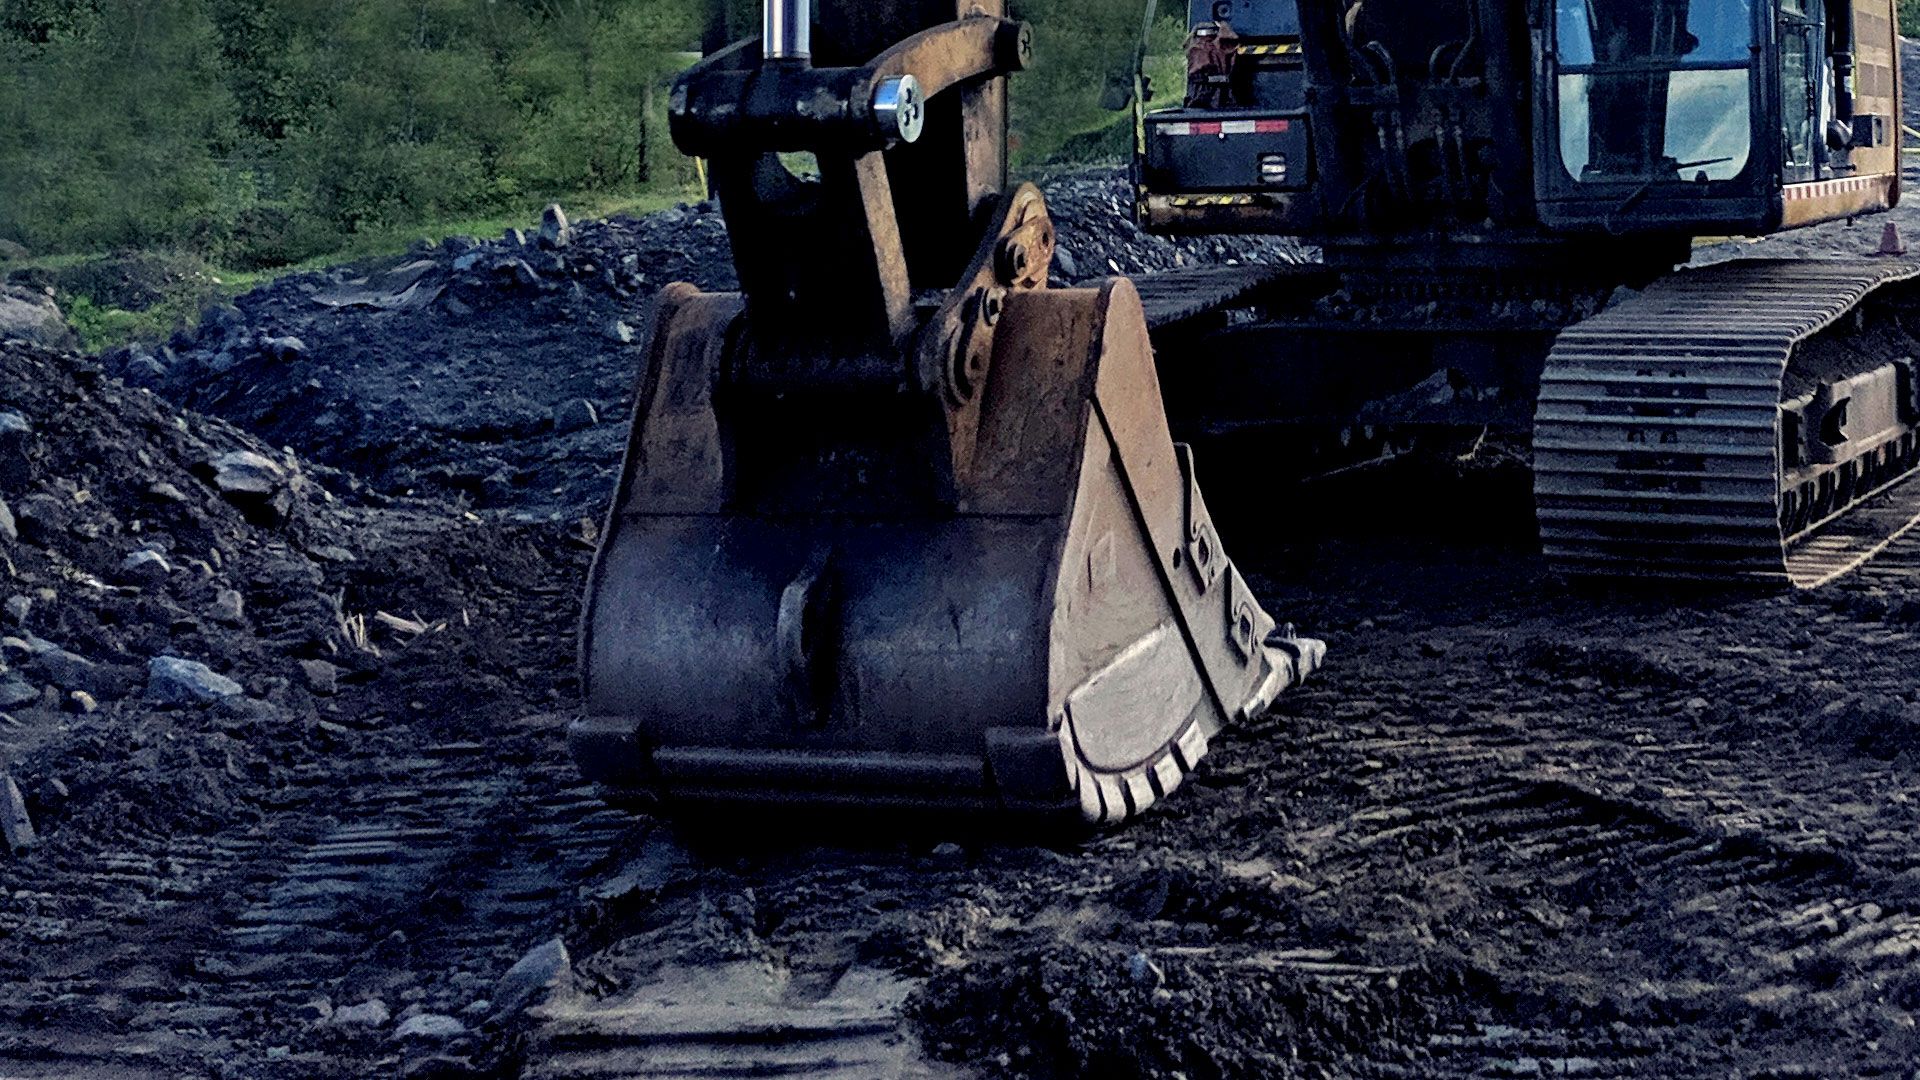 Hand Holding Brake Release Remote, underground scoop in the background